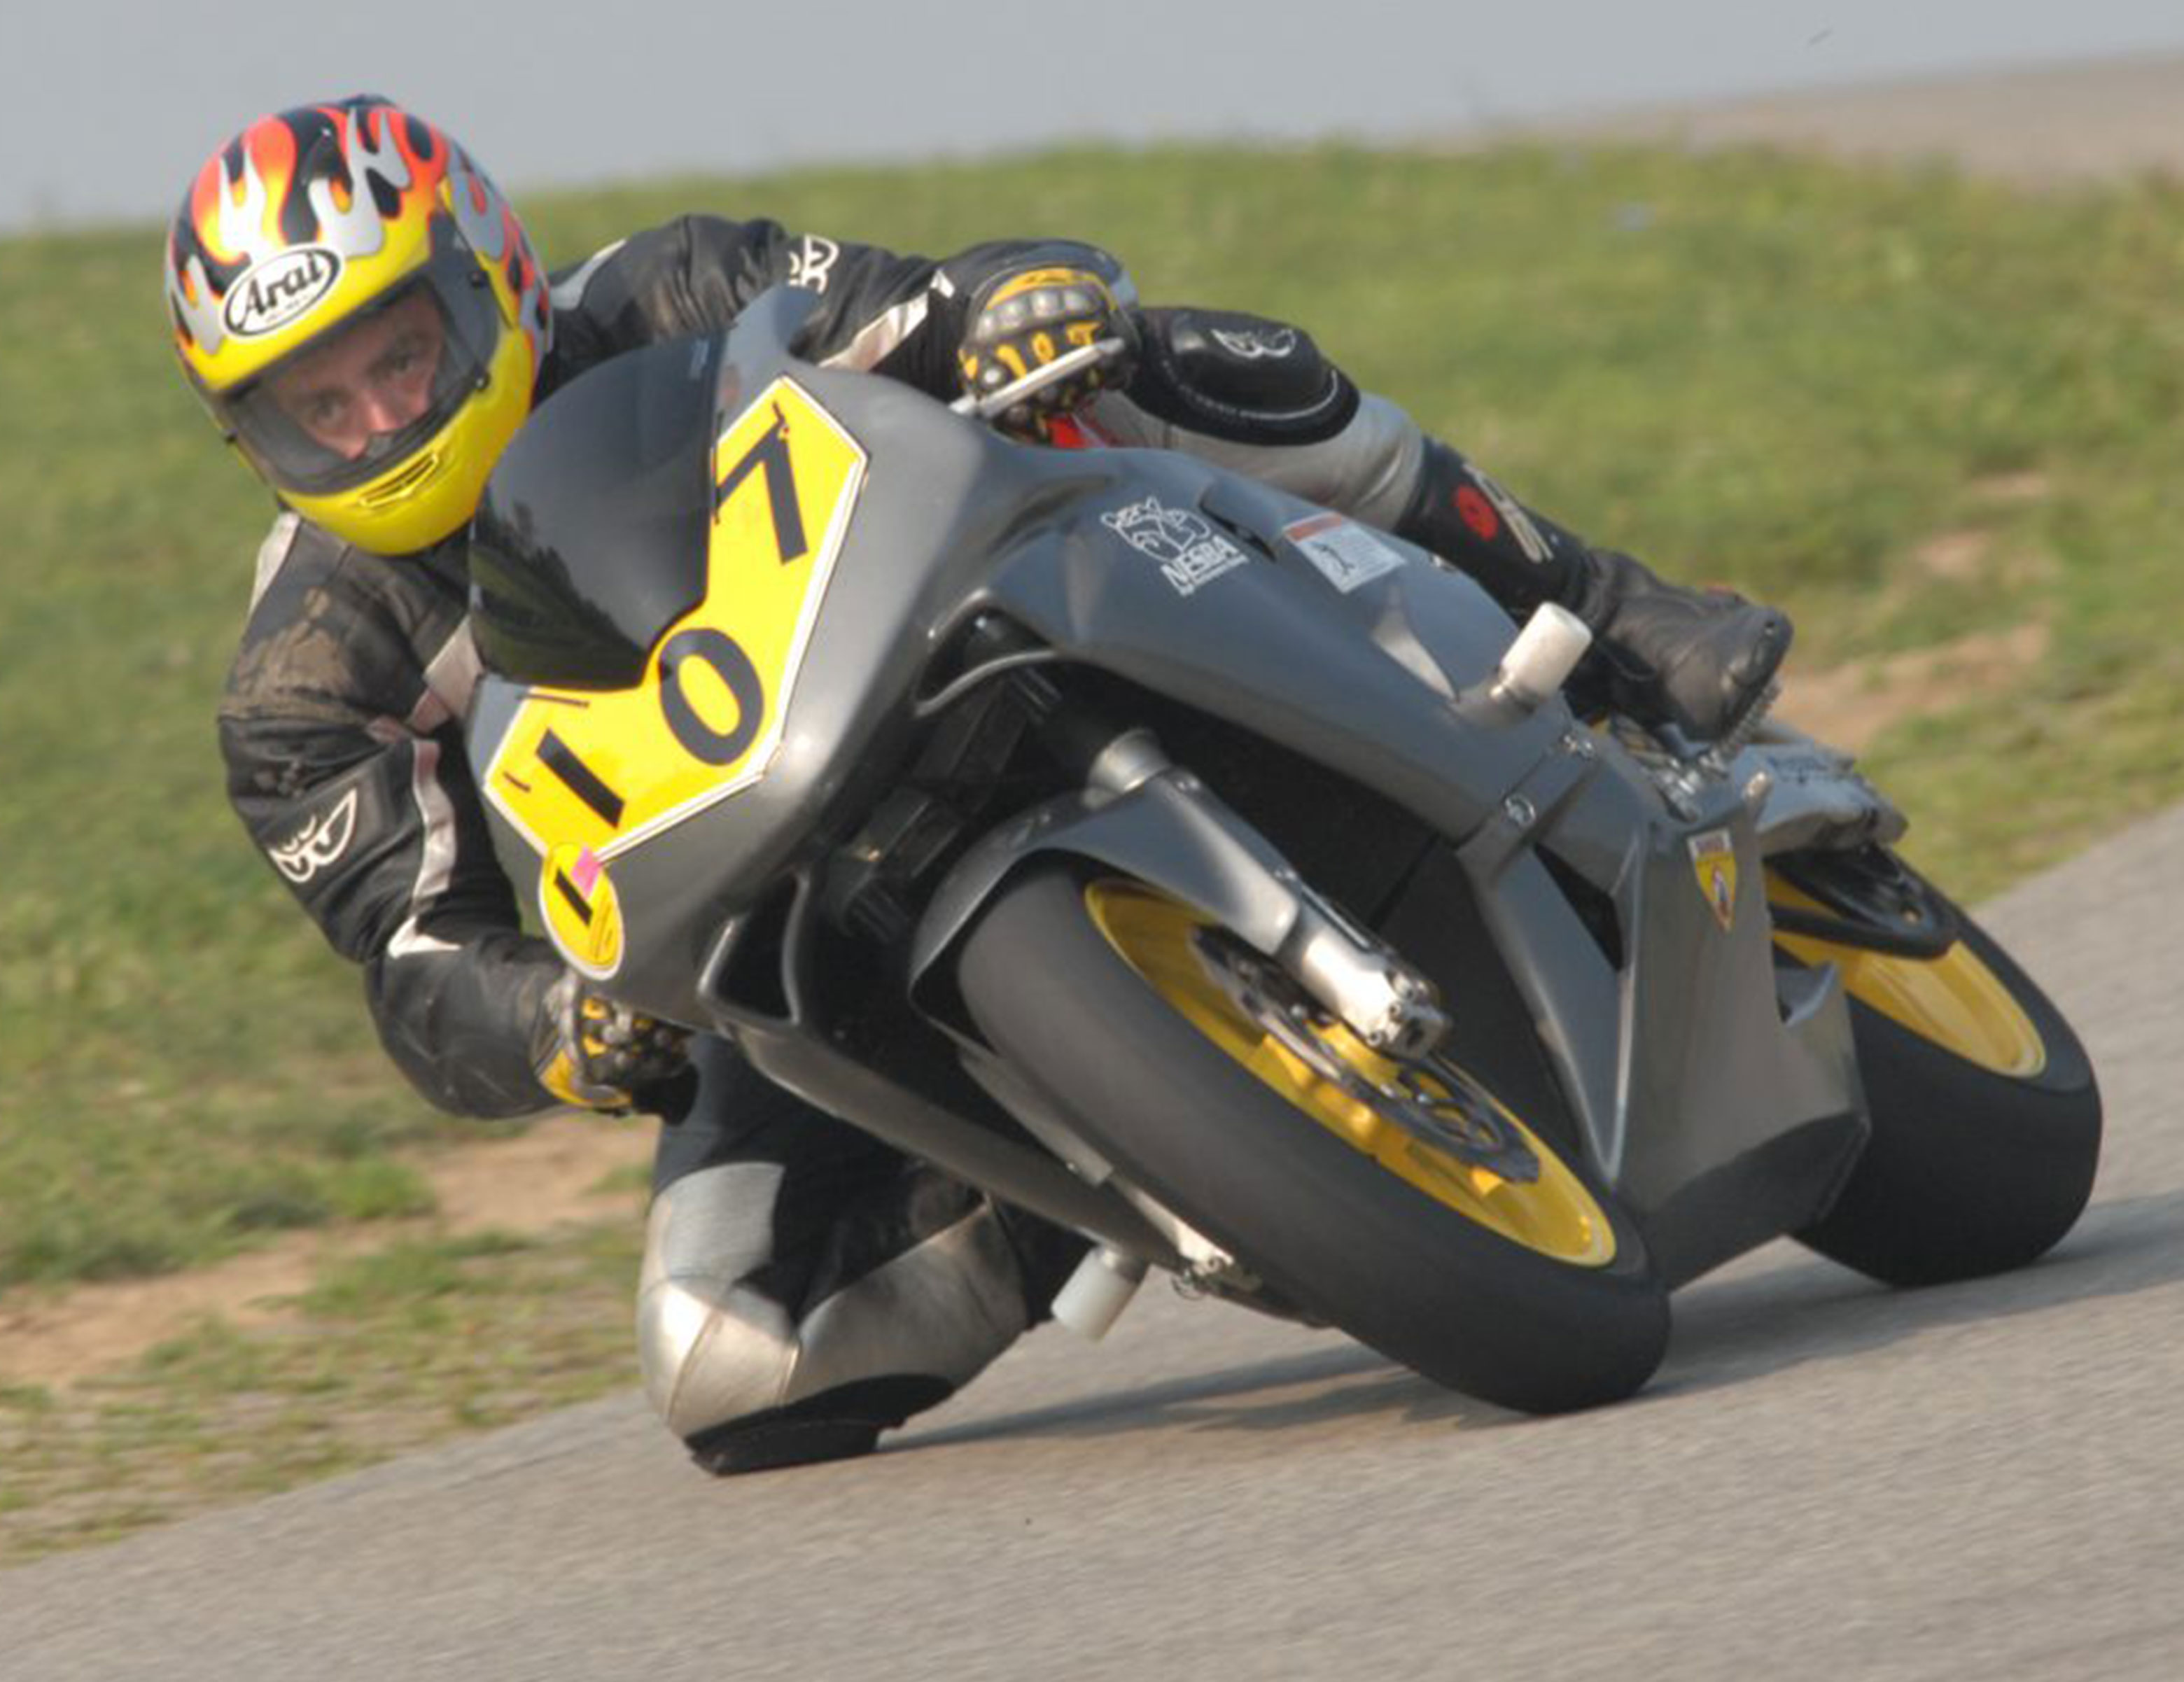 PJ Johns Motorcycle